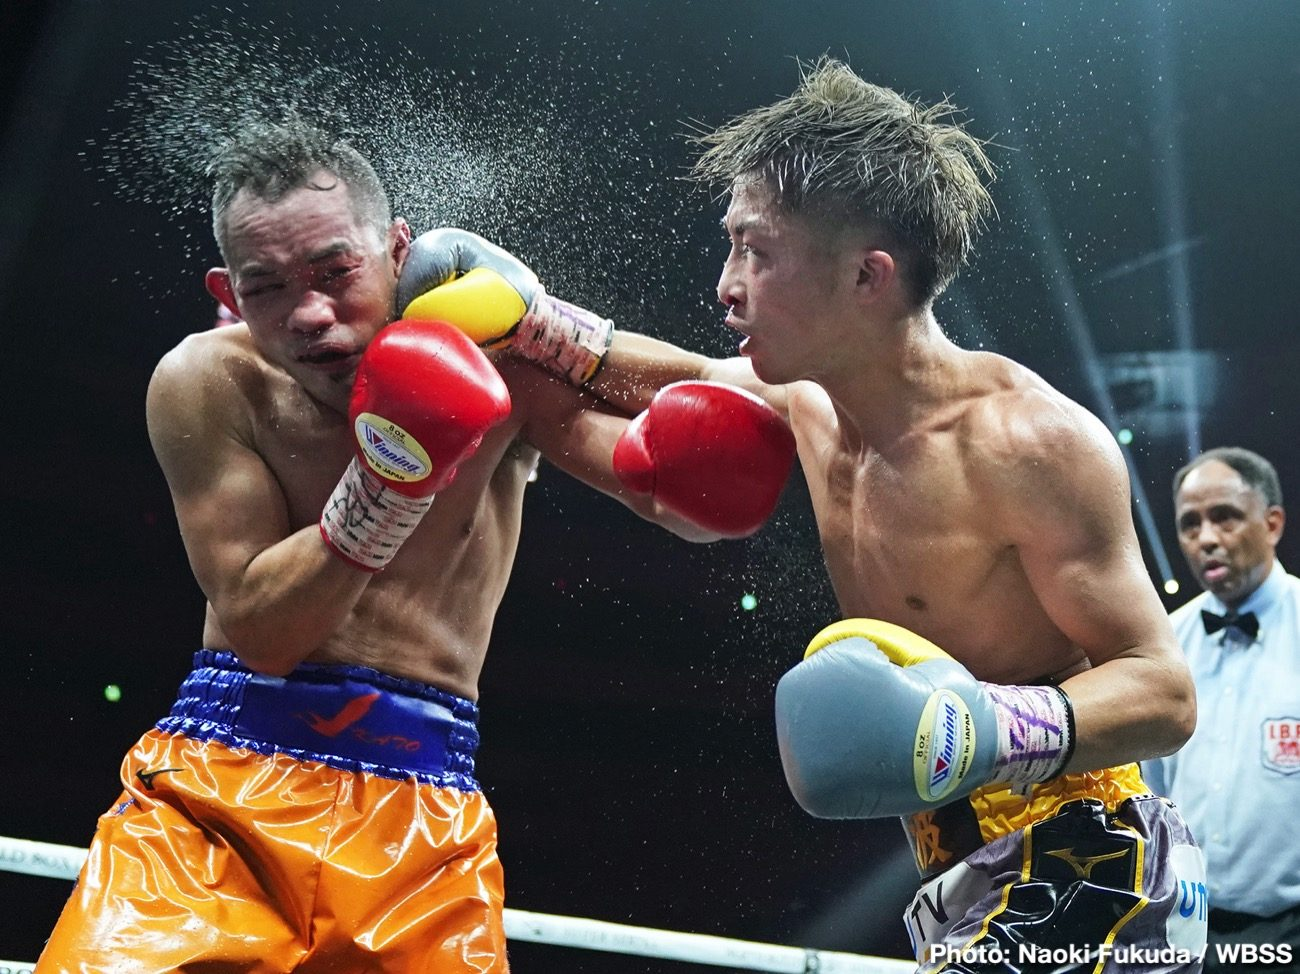 Naoya Inoue Nonito Donaire Nordine Oubaali Takuma Inoue Boxing News Boxing Results Top Stories Boxing